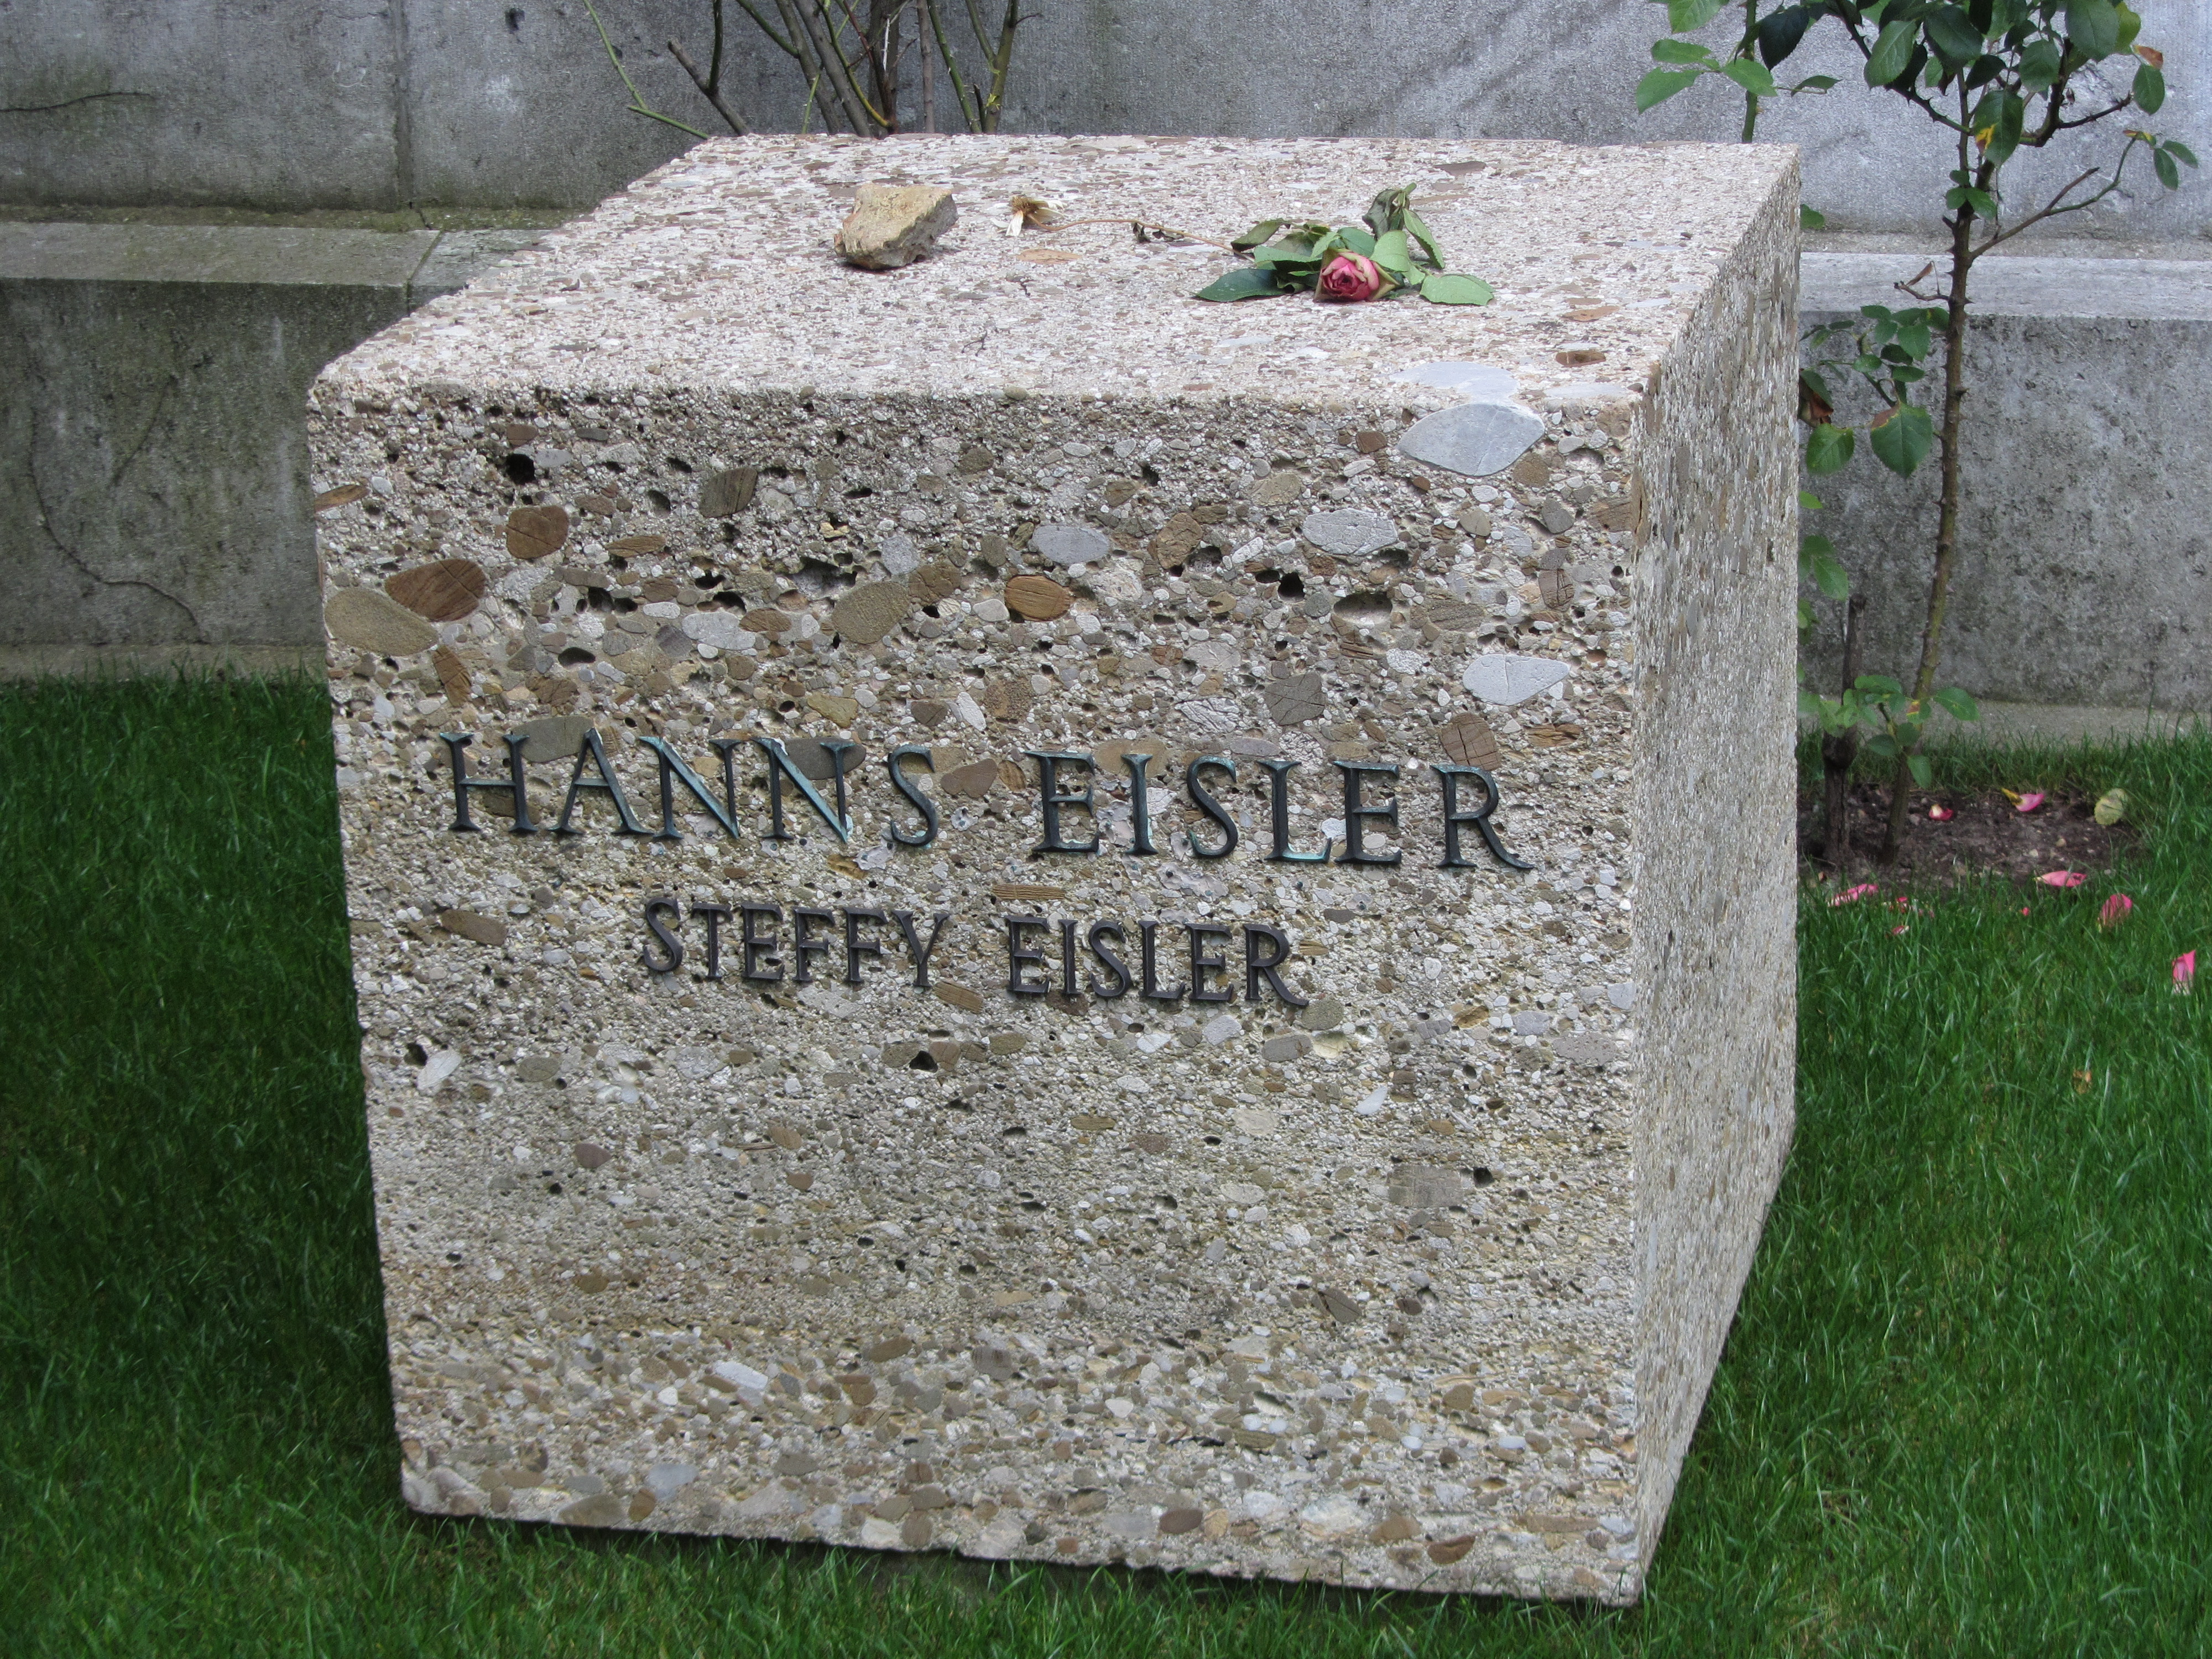 Tumba de Hanns Eisler en el cementerio de Dorotheenstadt en Berlín.